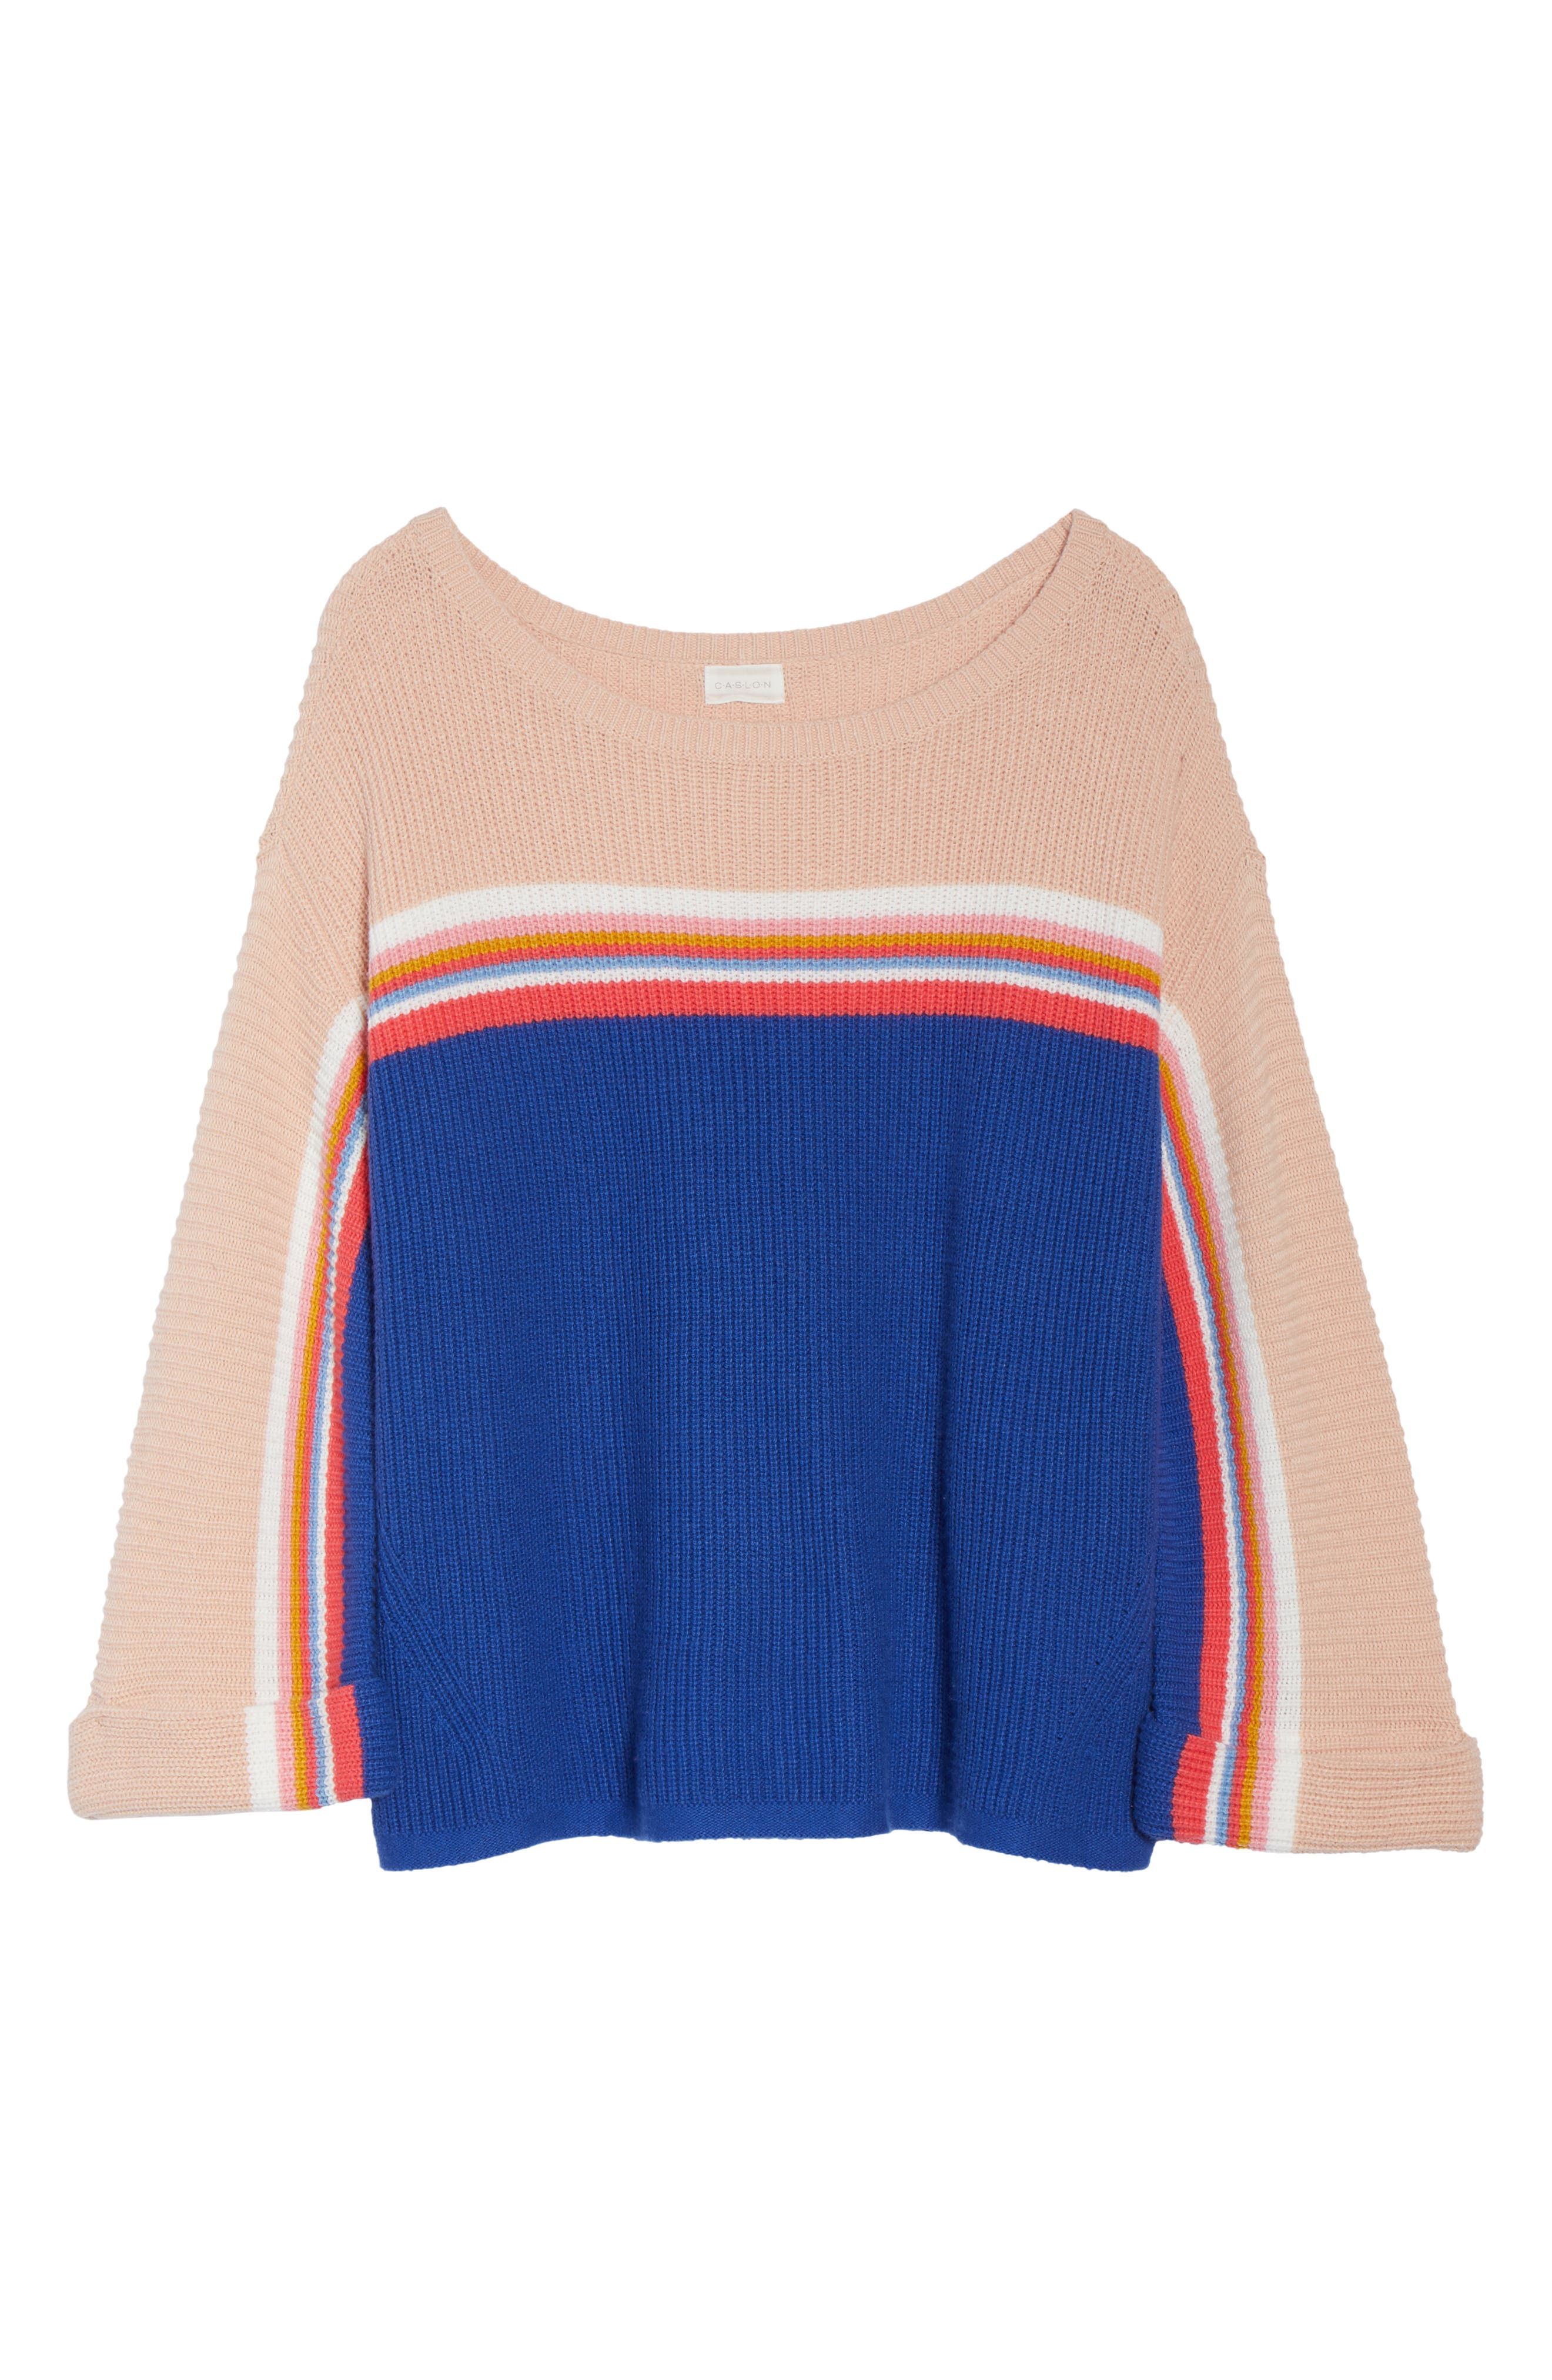 Shaker Stitch Sweater,                             Alternate thumbnail 6, color,                             401